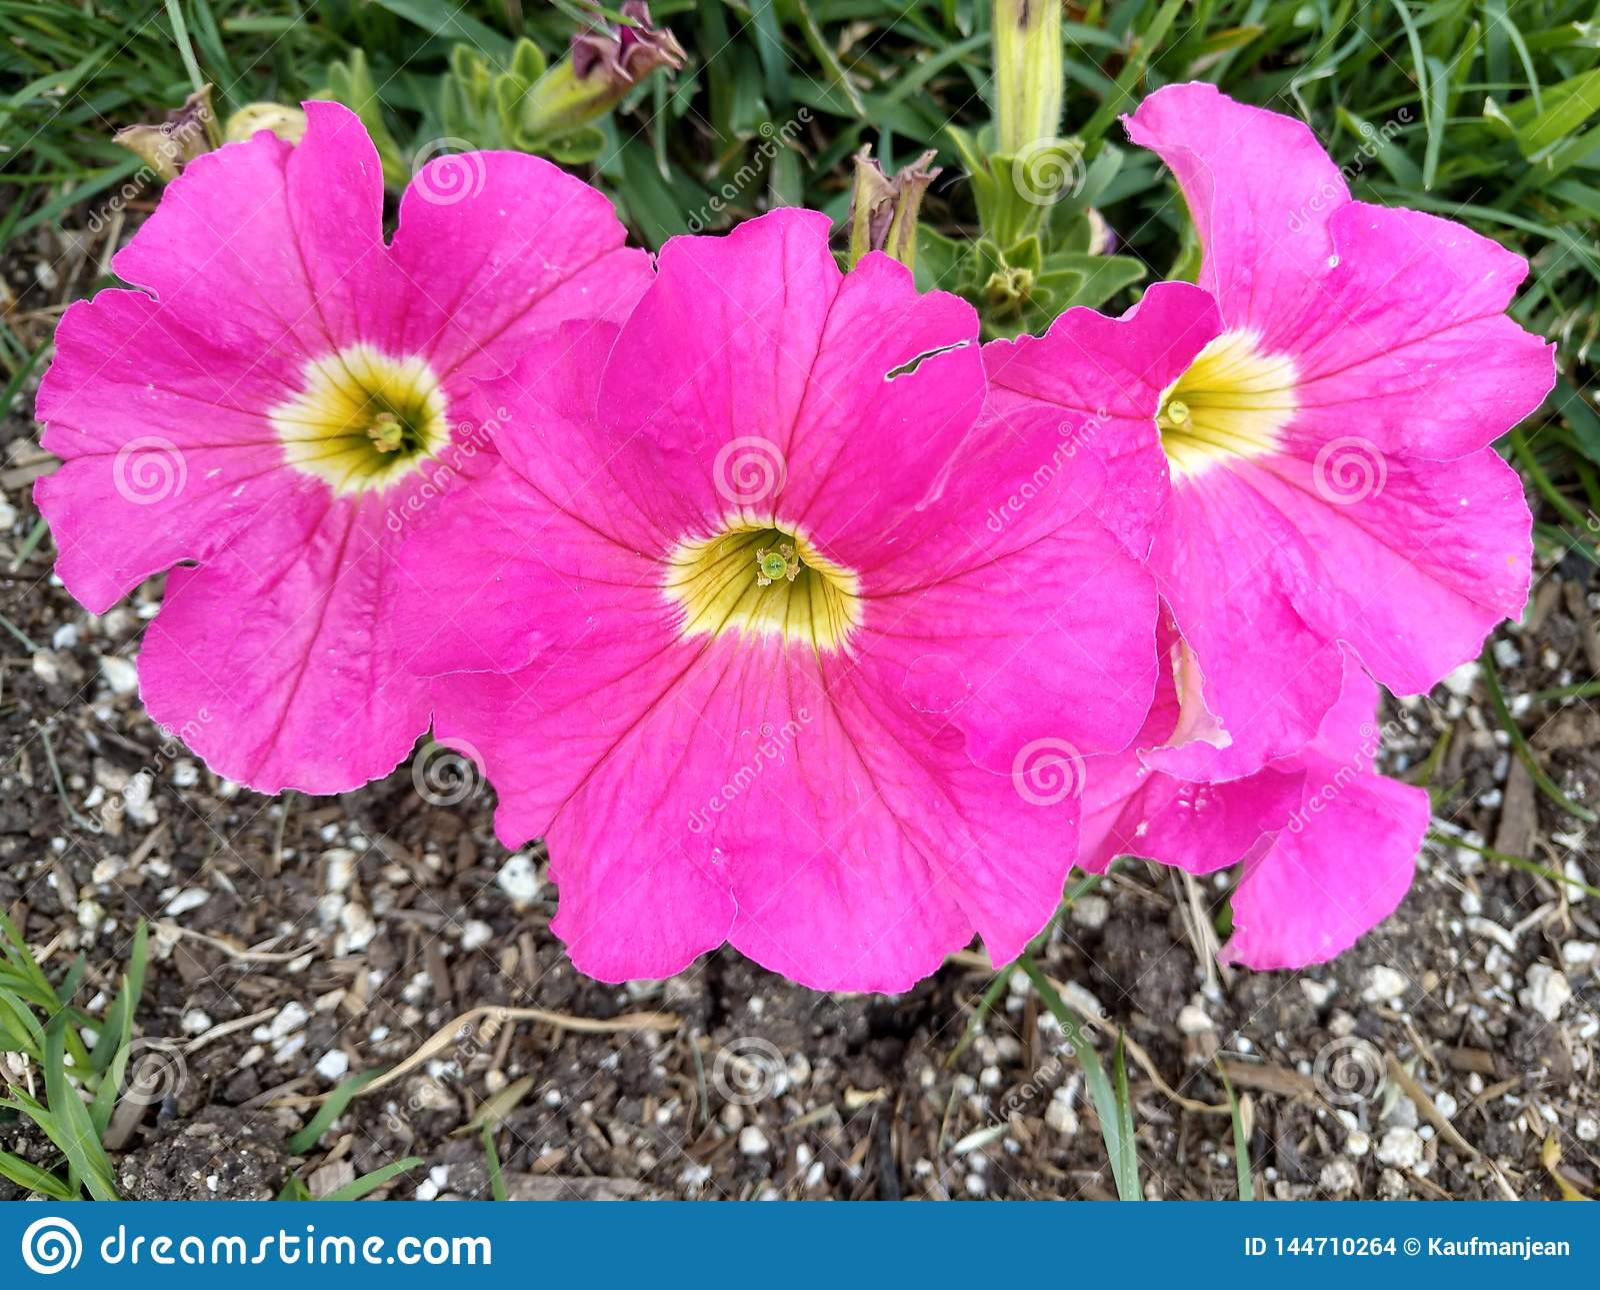 Hot Pink Hollyhocks mallow family flowers cottage garden annual biennial or perennial Alcea plants